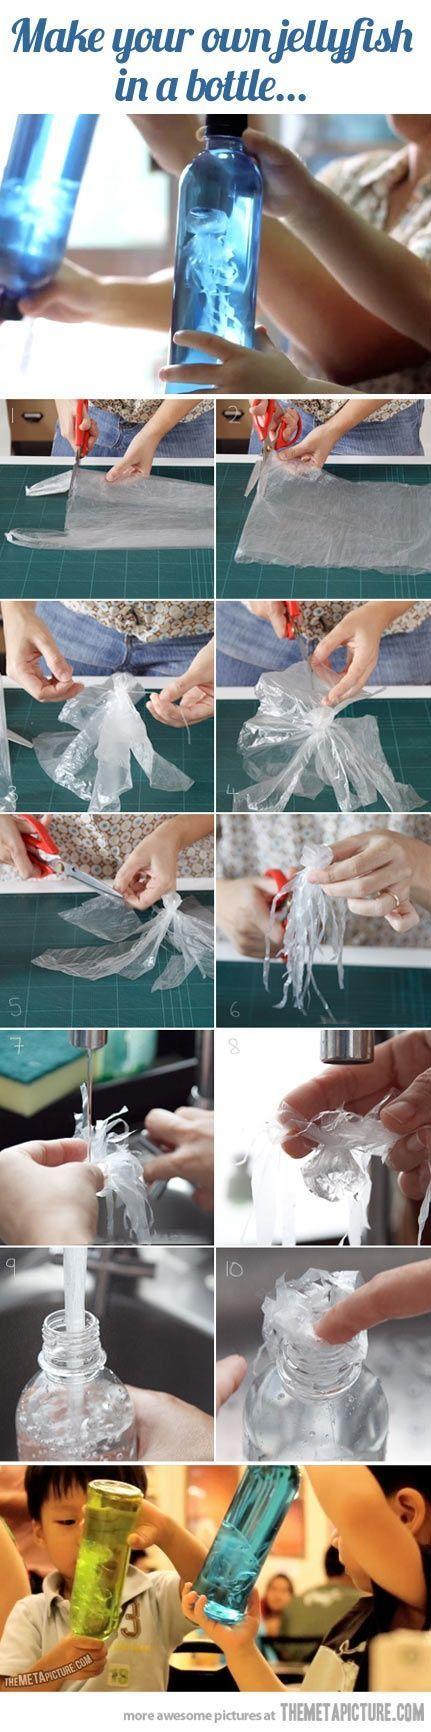 DIY Pet Jellyfish Kids Craft // #kids #activities #jellyfish